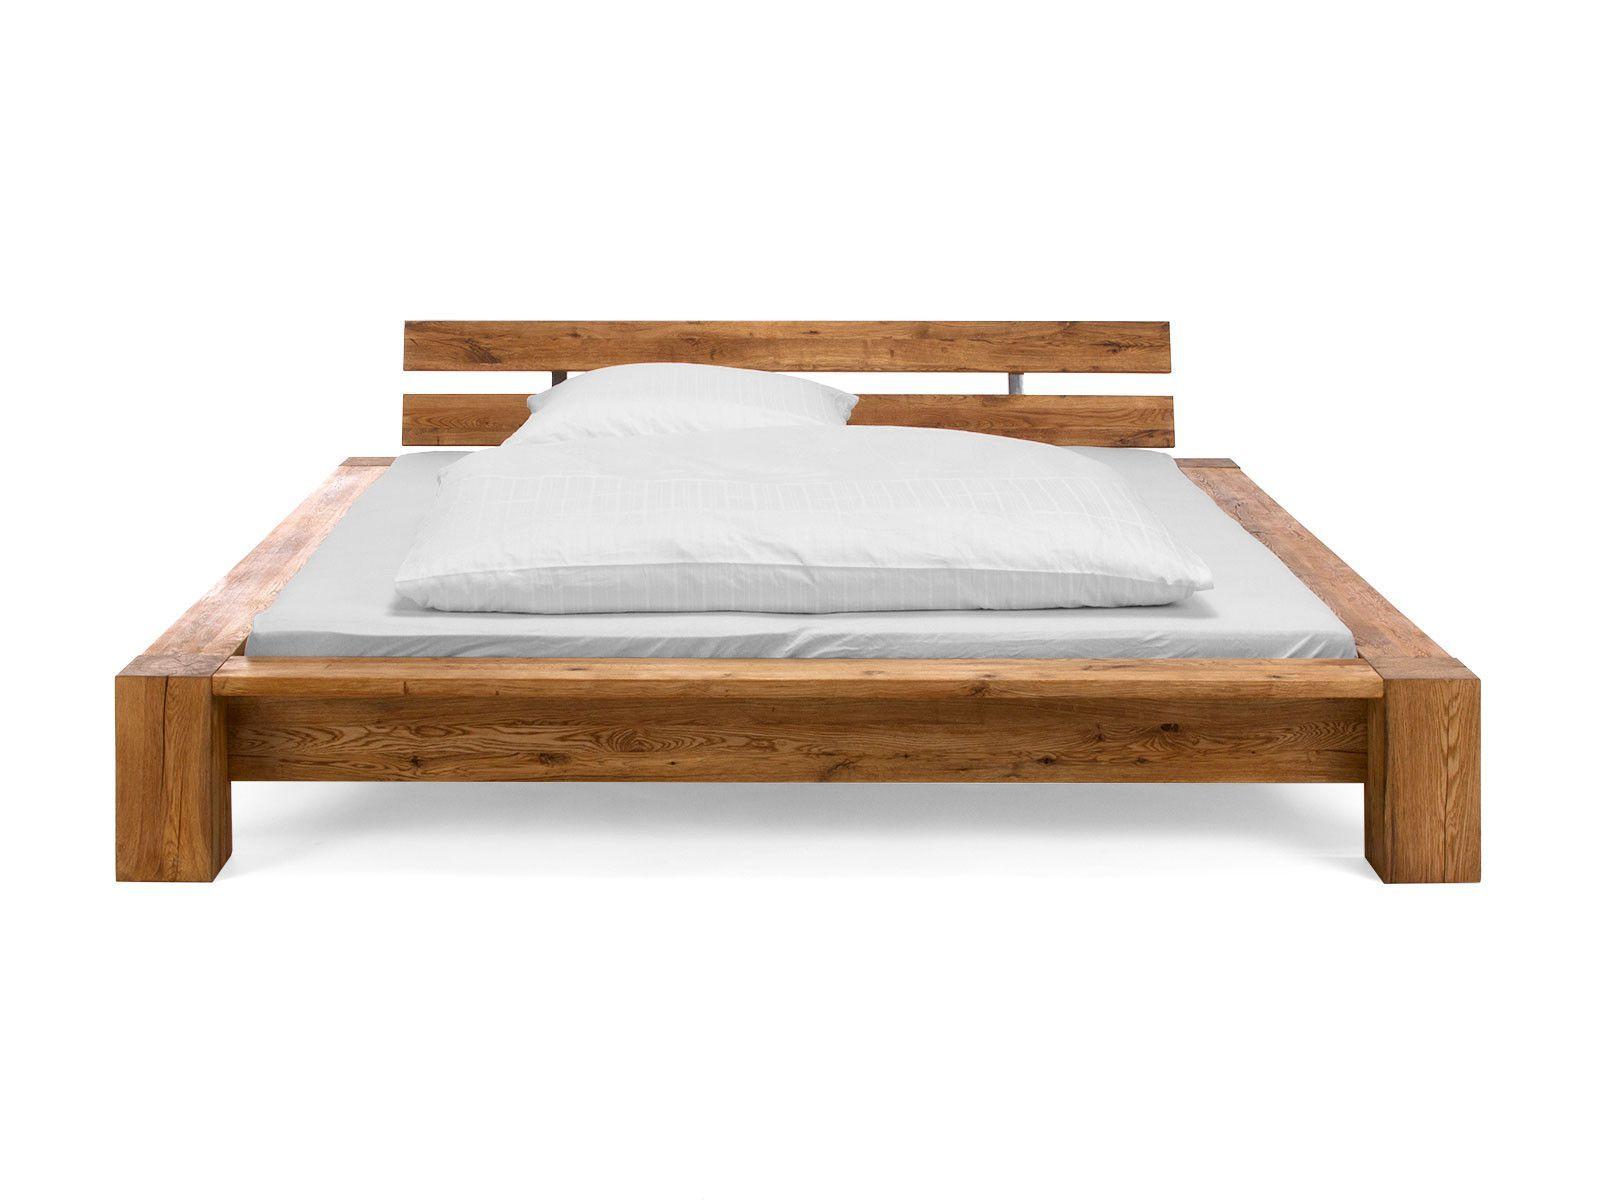 Bett Zamora Eiche Geolt Holzbetten Von Massivum Bett In 2019 Mary